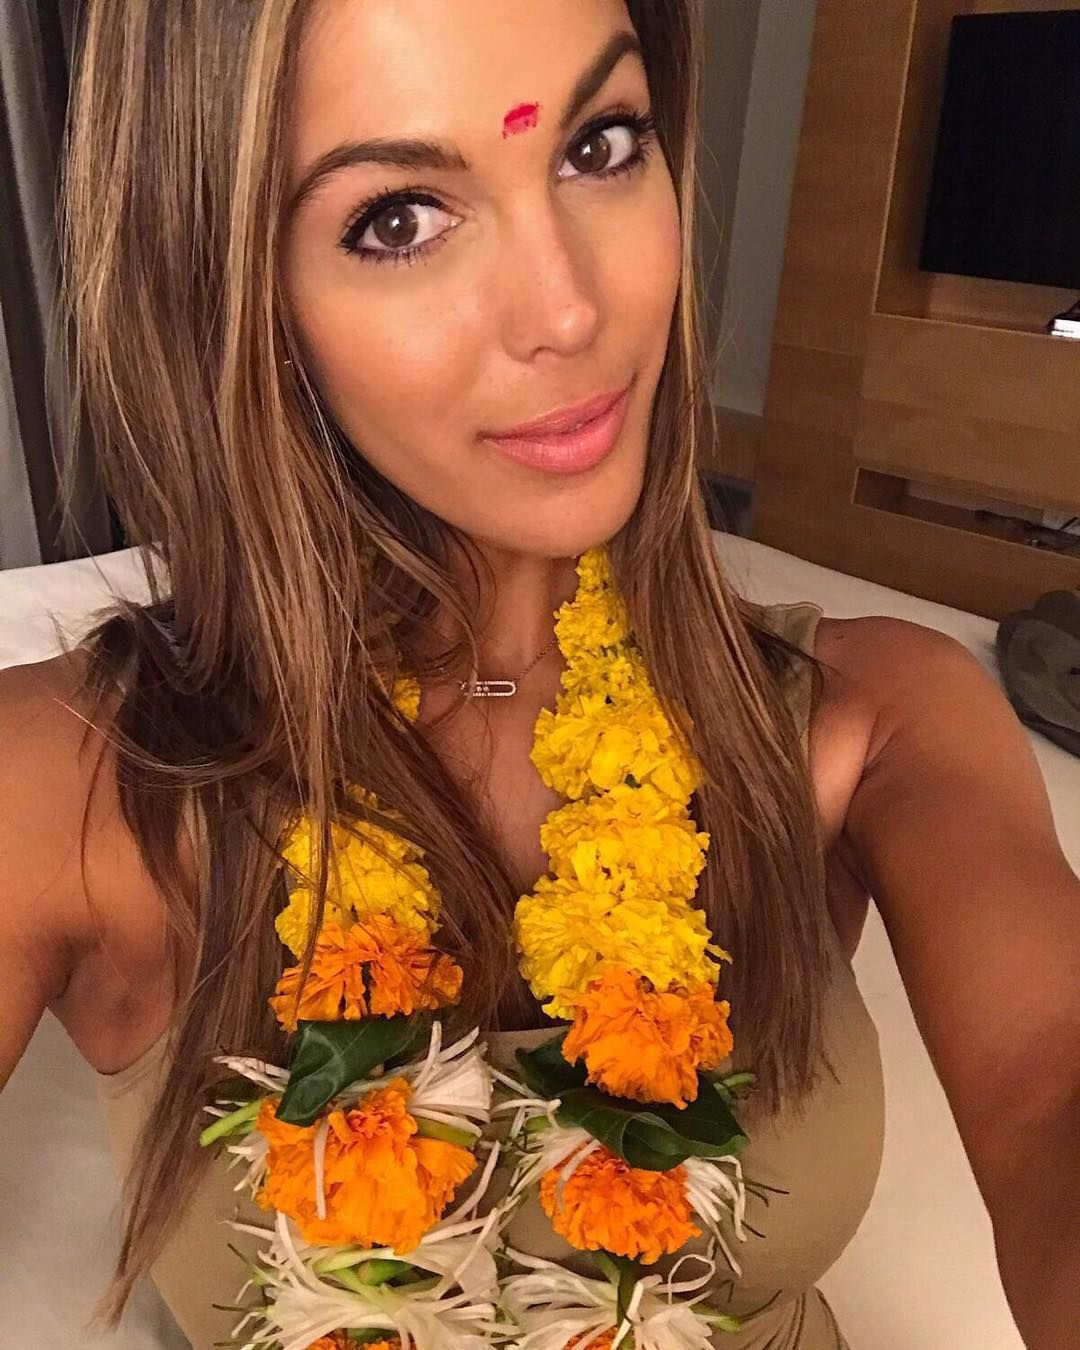 MissUniverse Iris Mittenaere has landed in India!